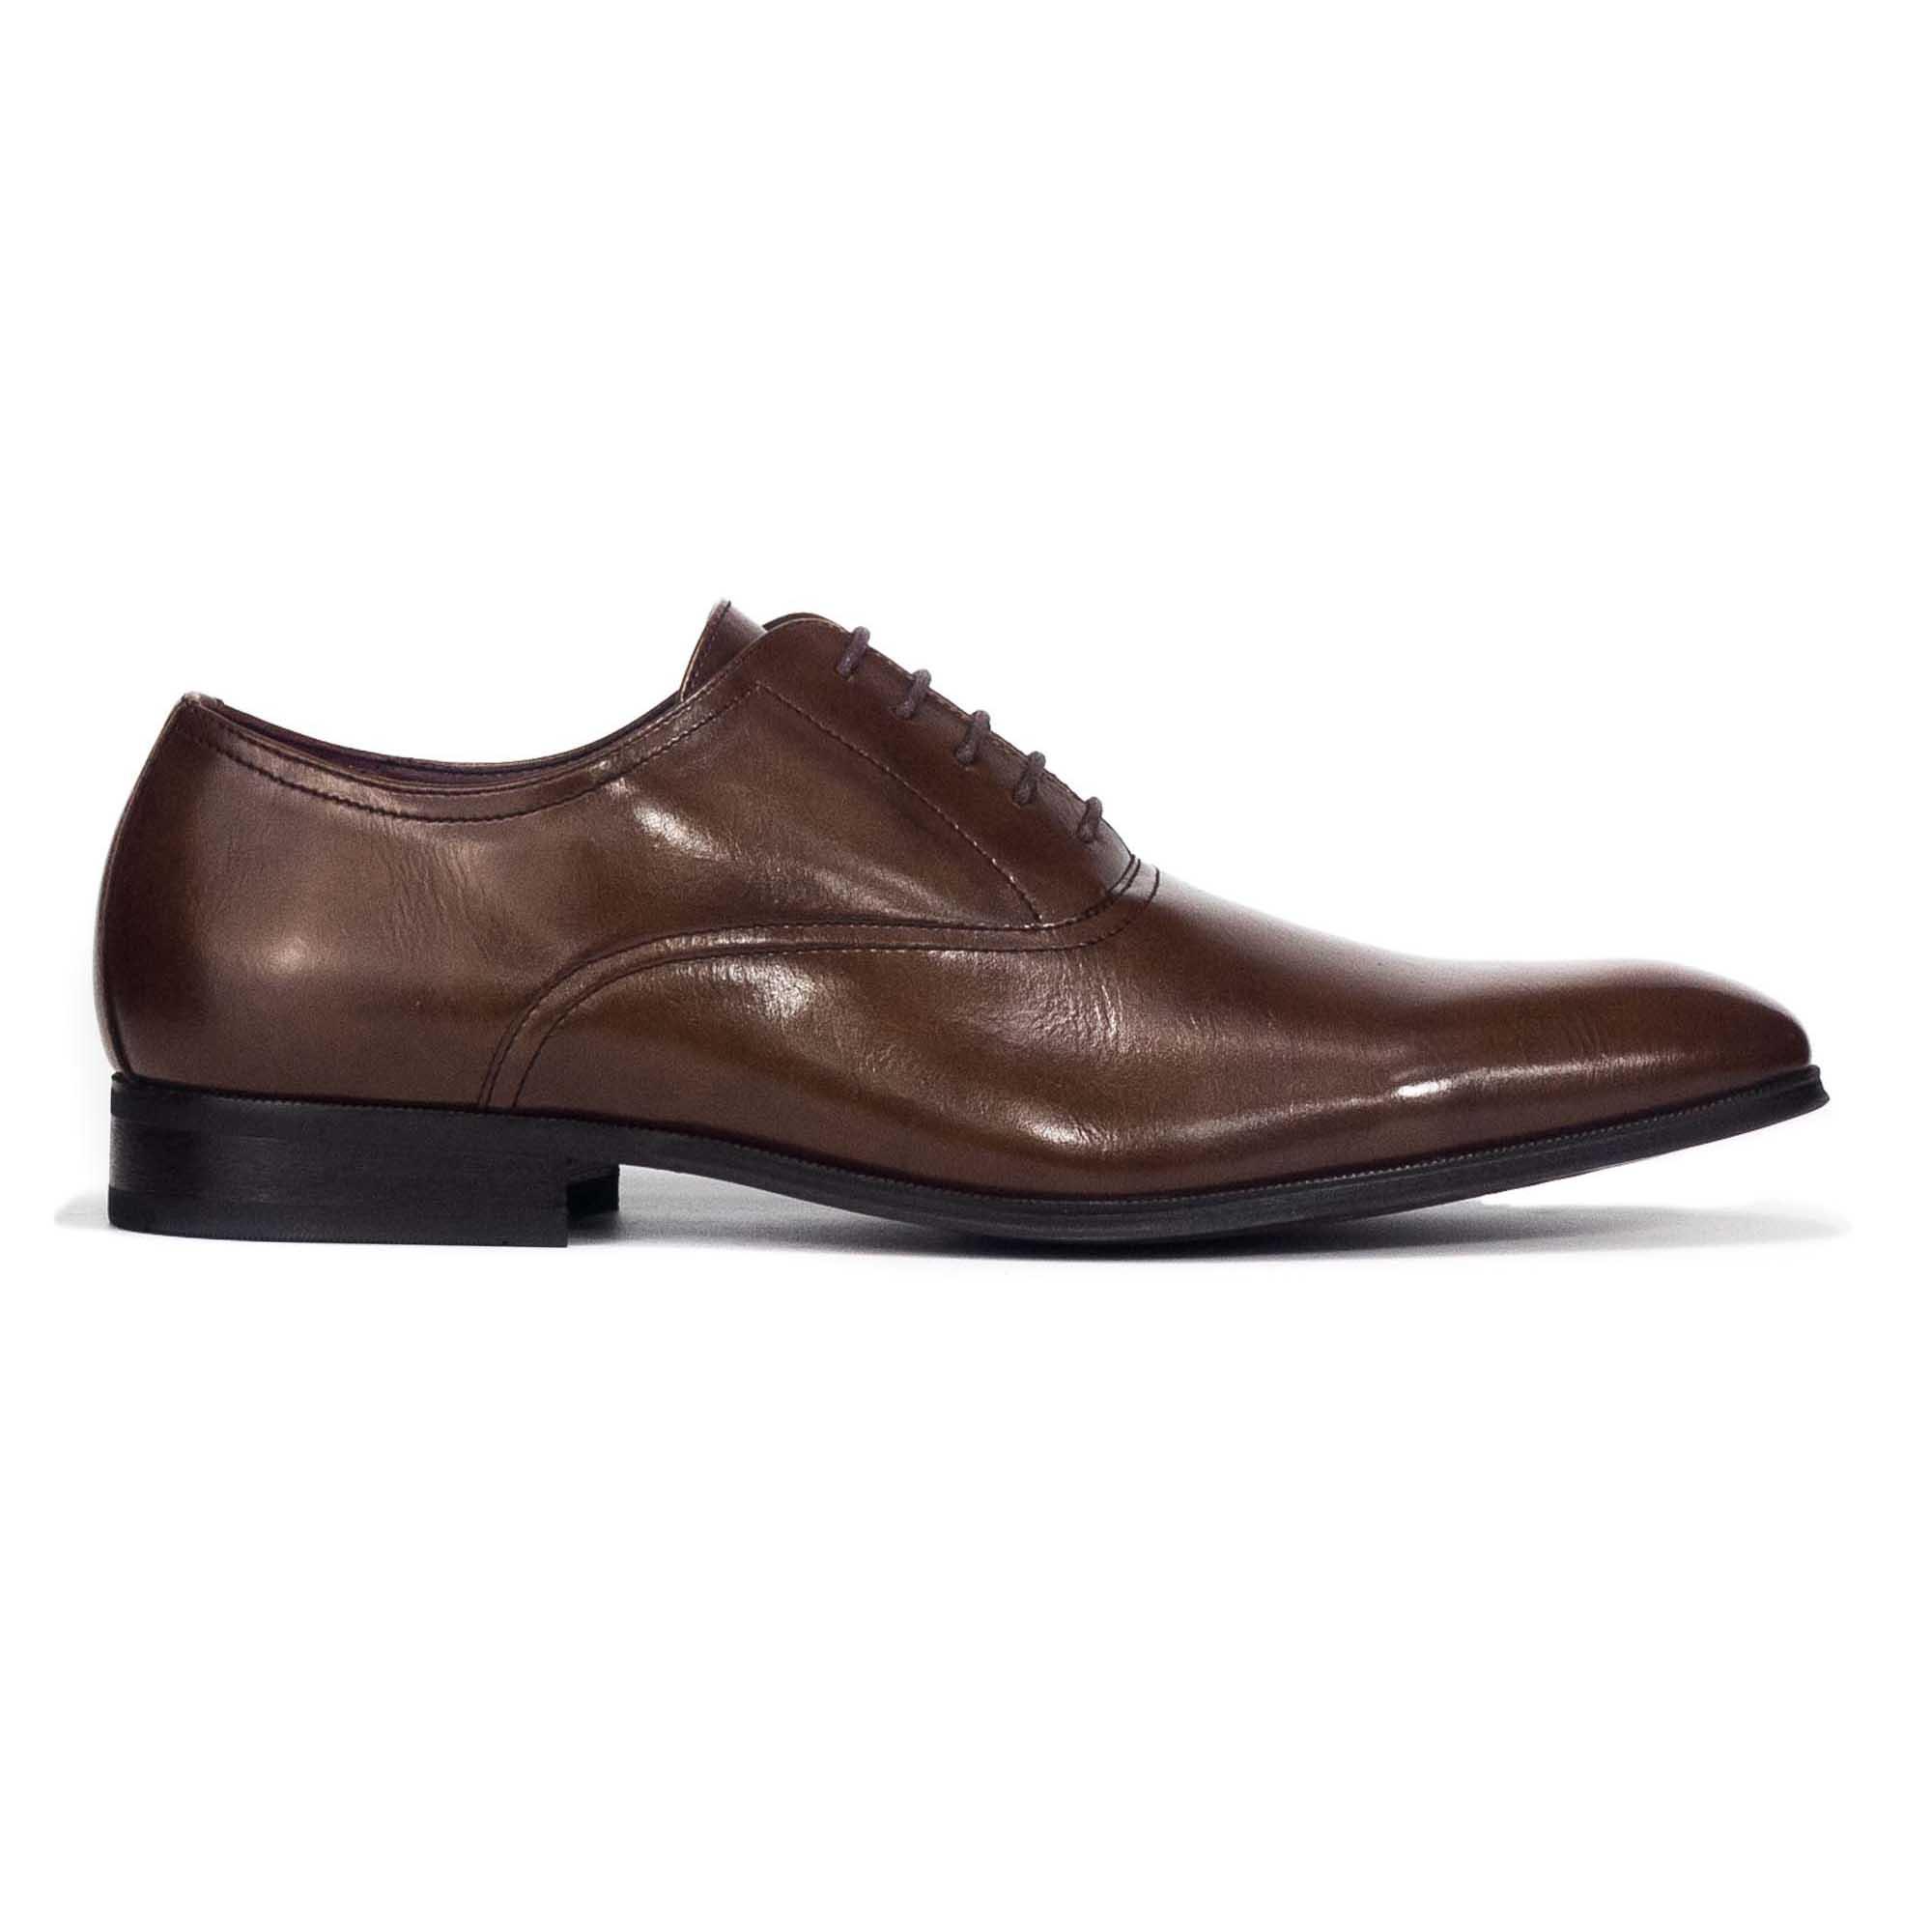 Bata Men Oxford Slip On Brown 8214003 For Sale